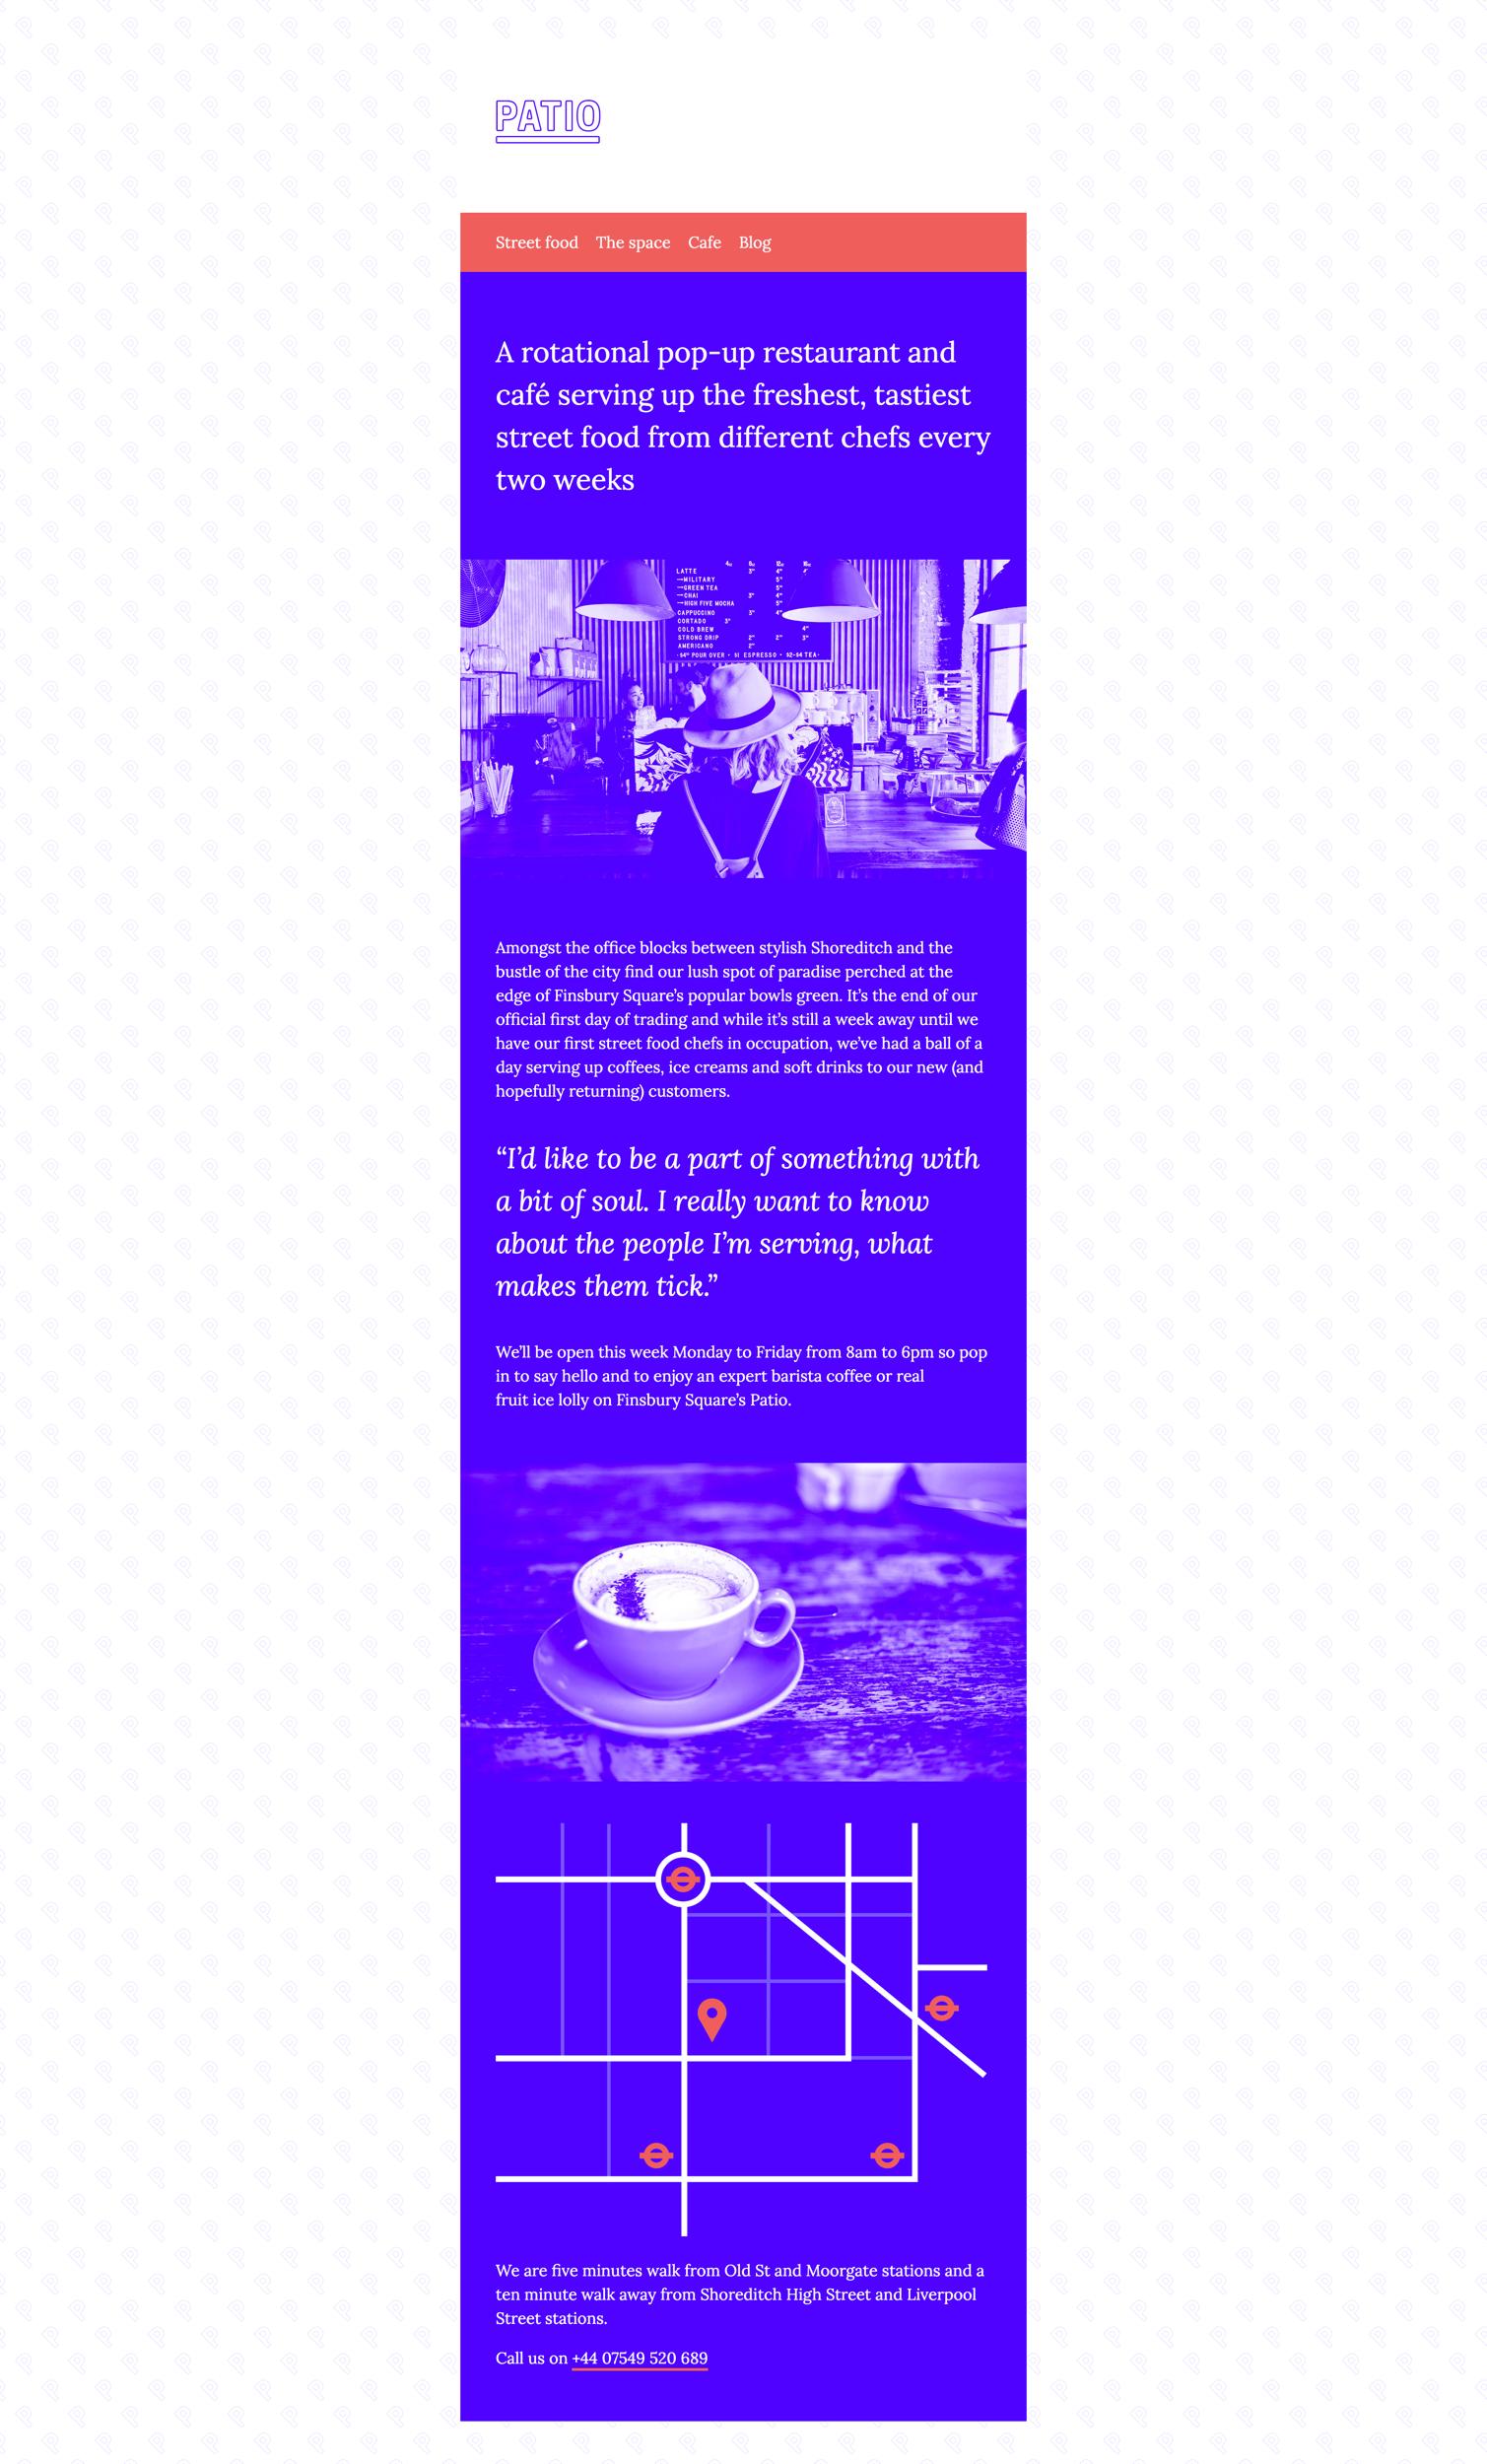 screencapture-patio-cafe-business-herokuapp-index-html-2019-11-24-15_07_01